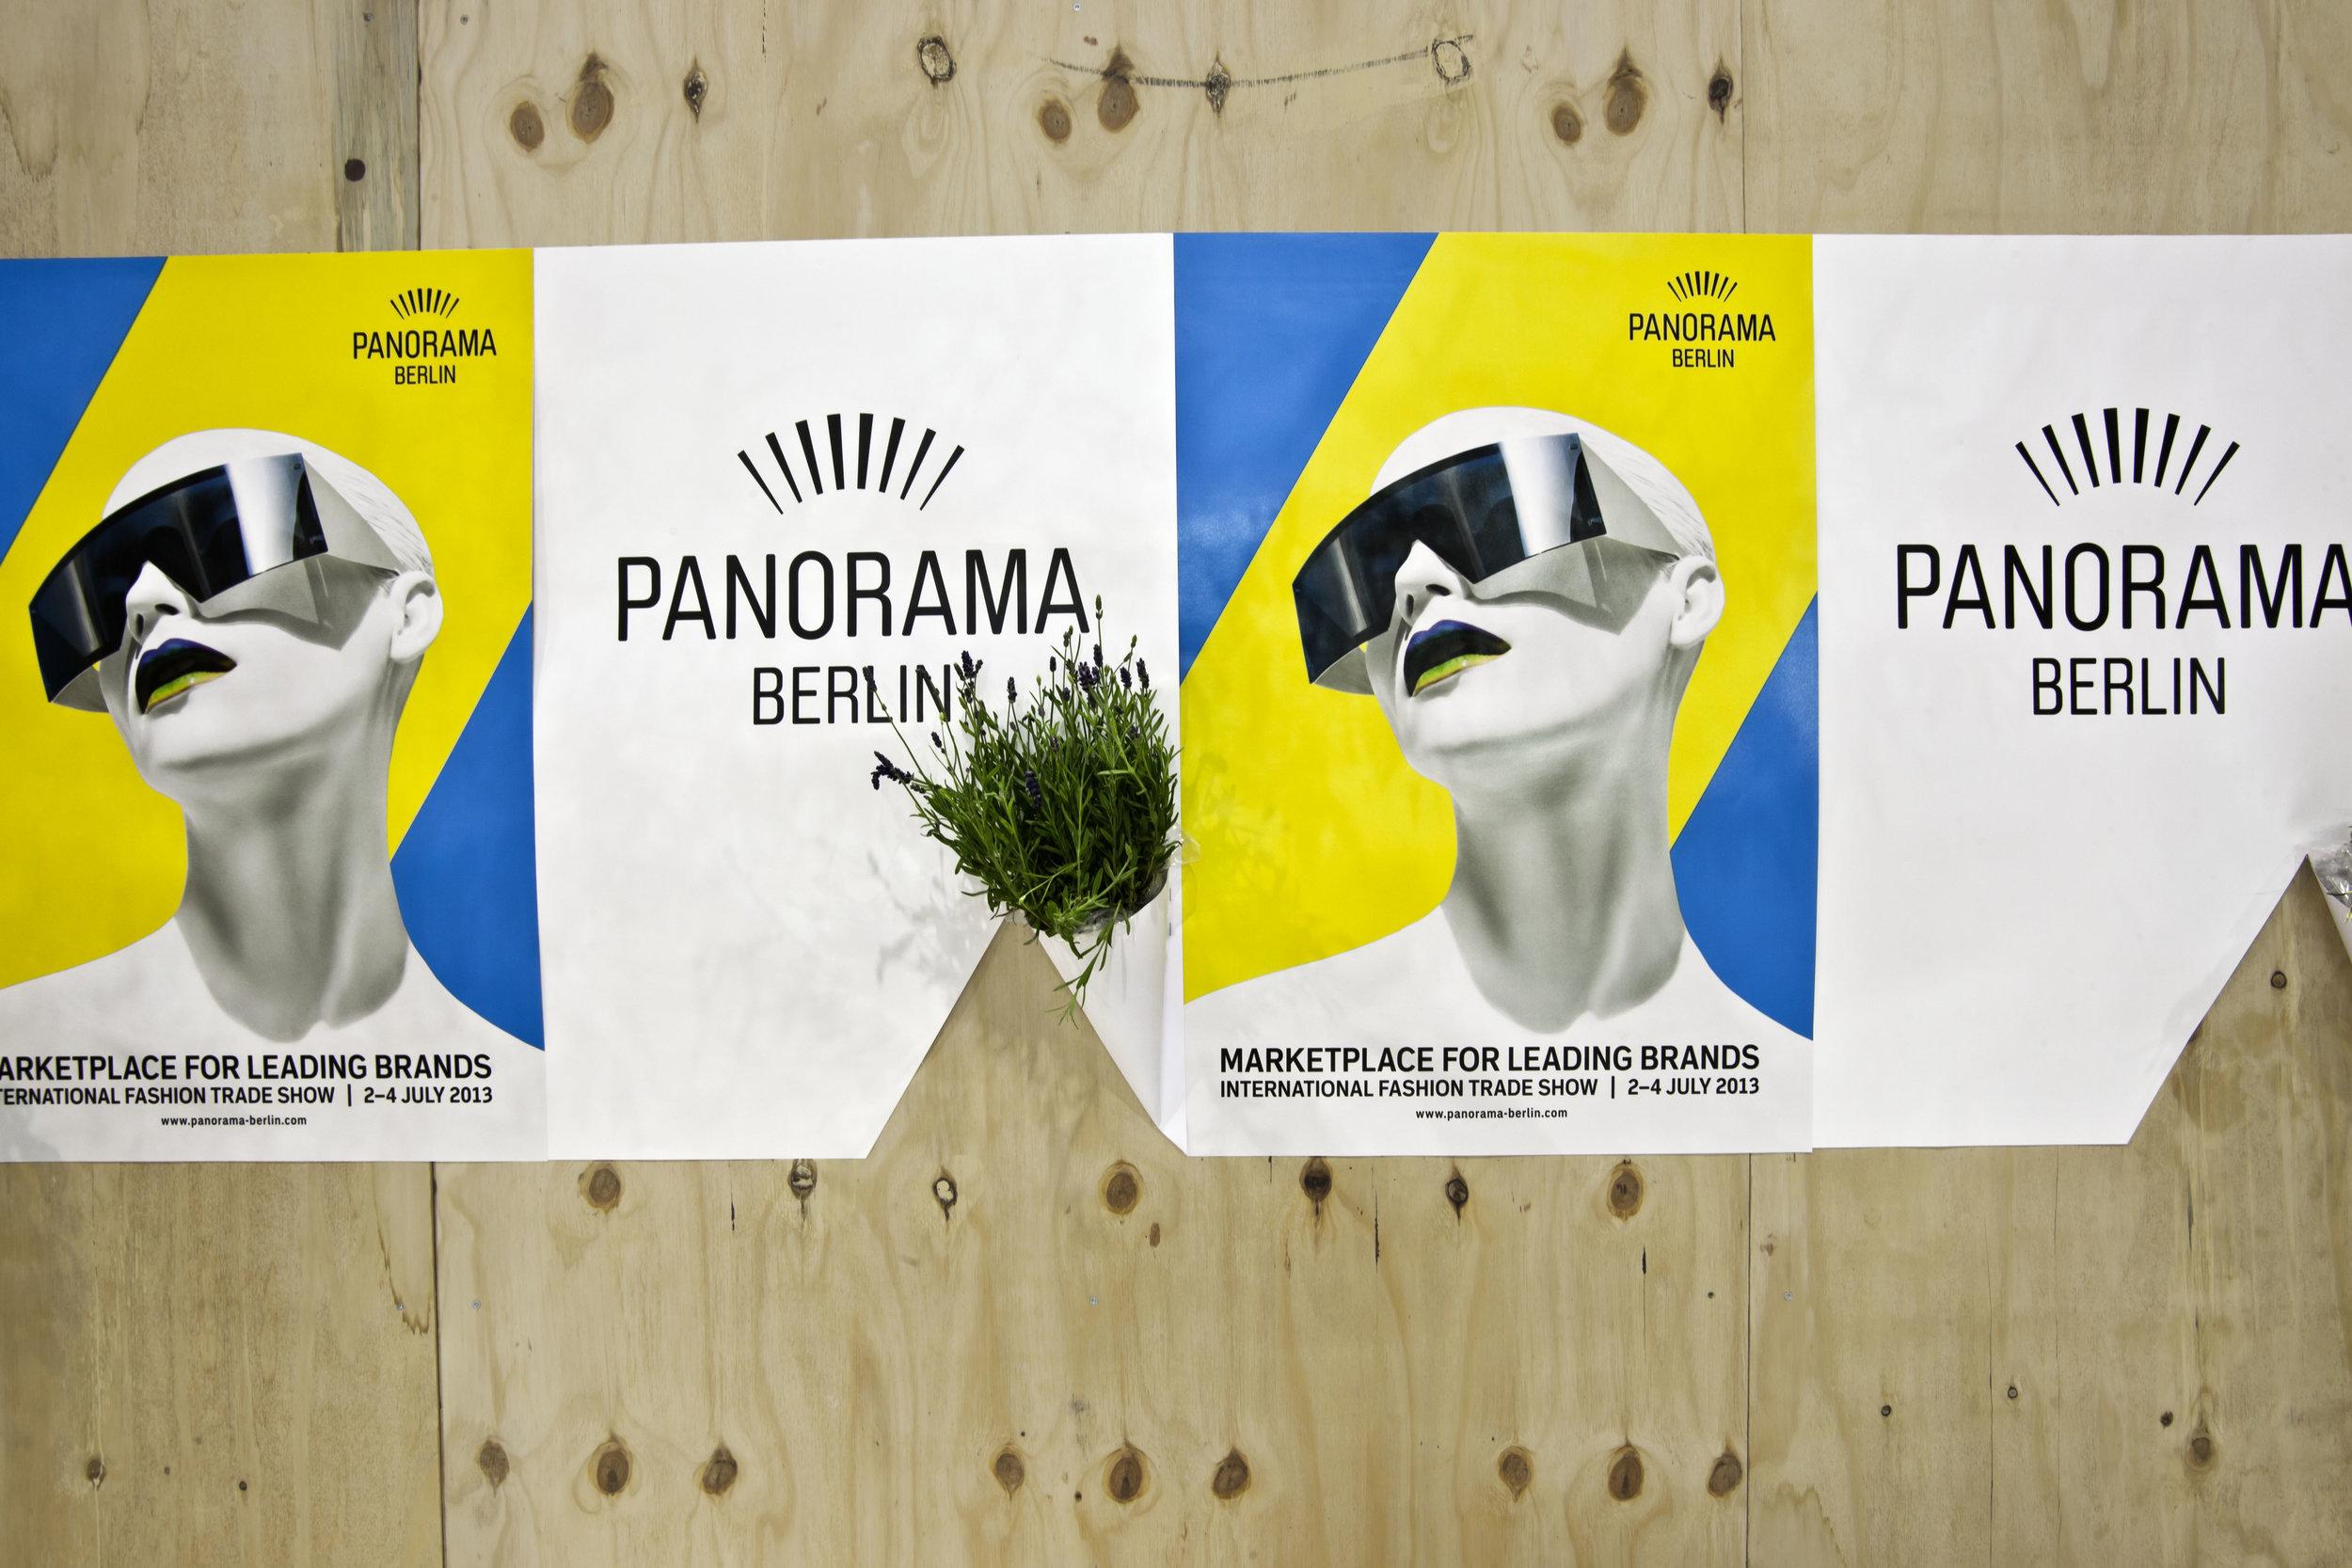 panorama_tradefair-exhibition-design_coordination-berlin_01.jpg